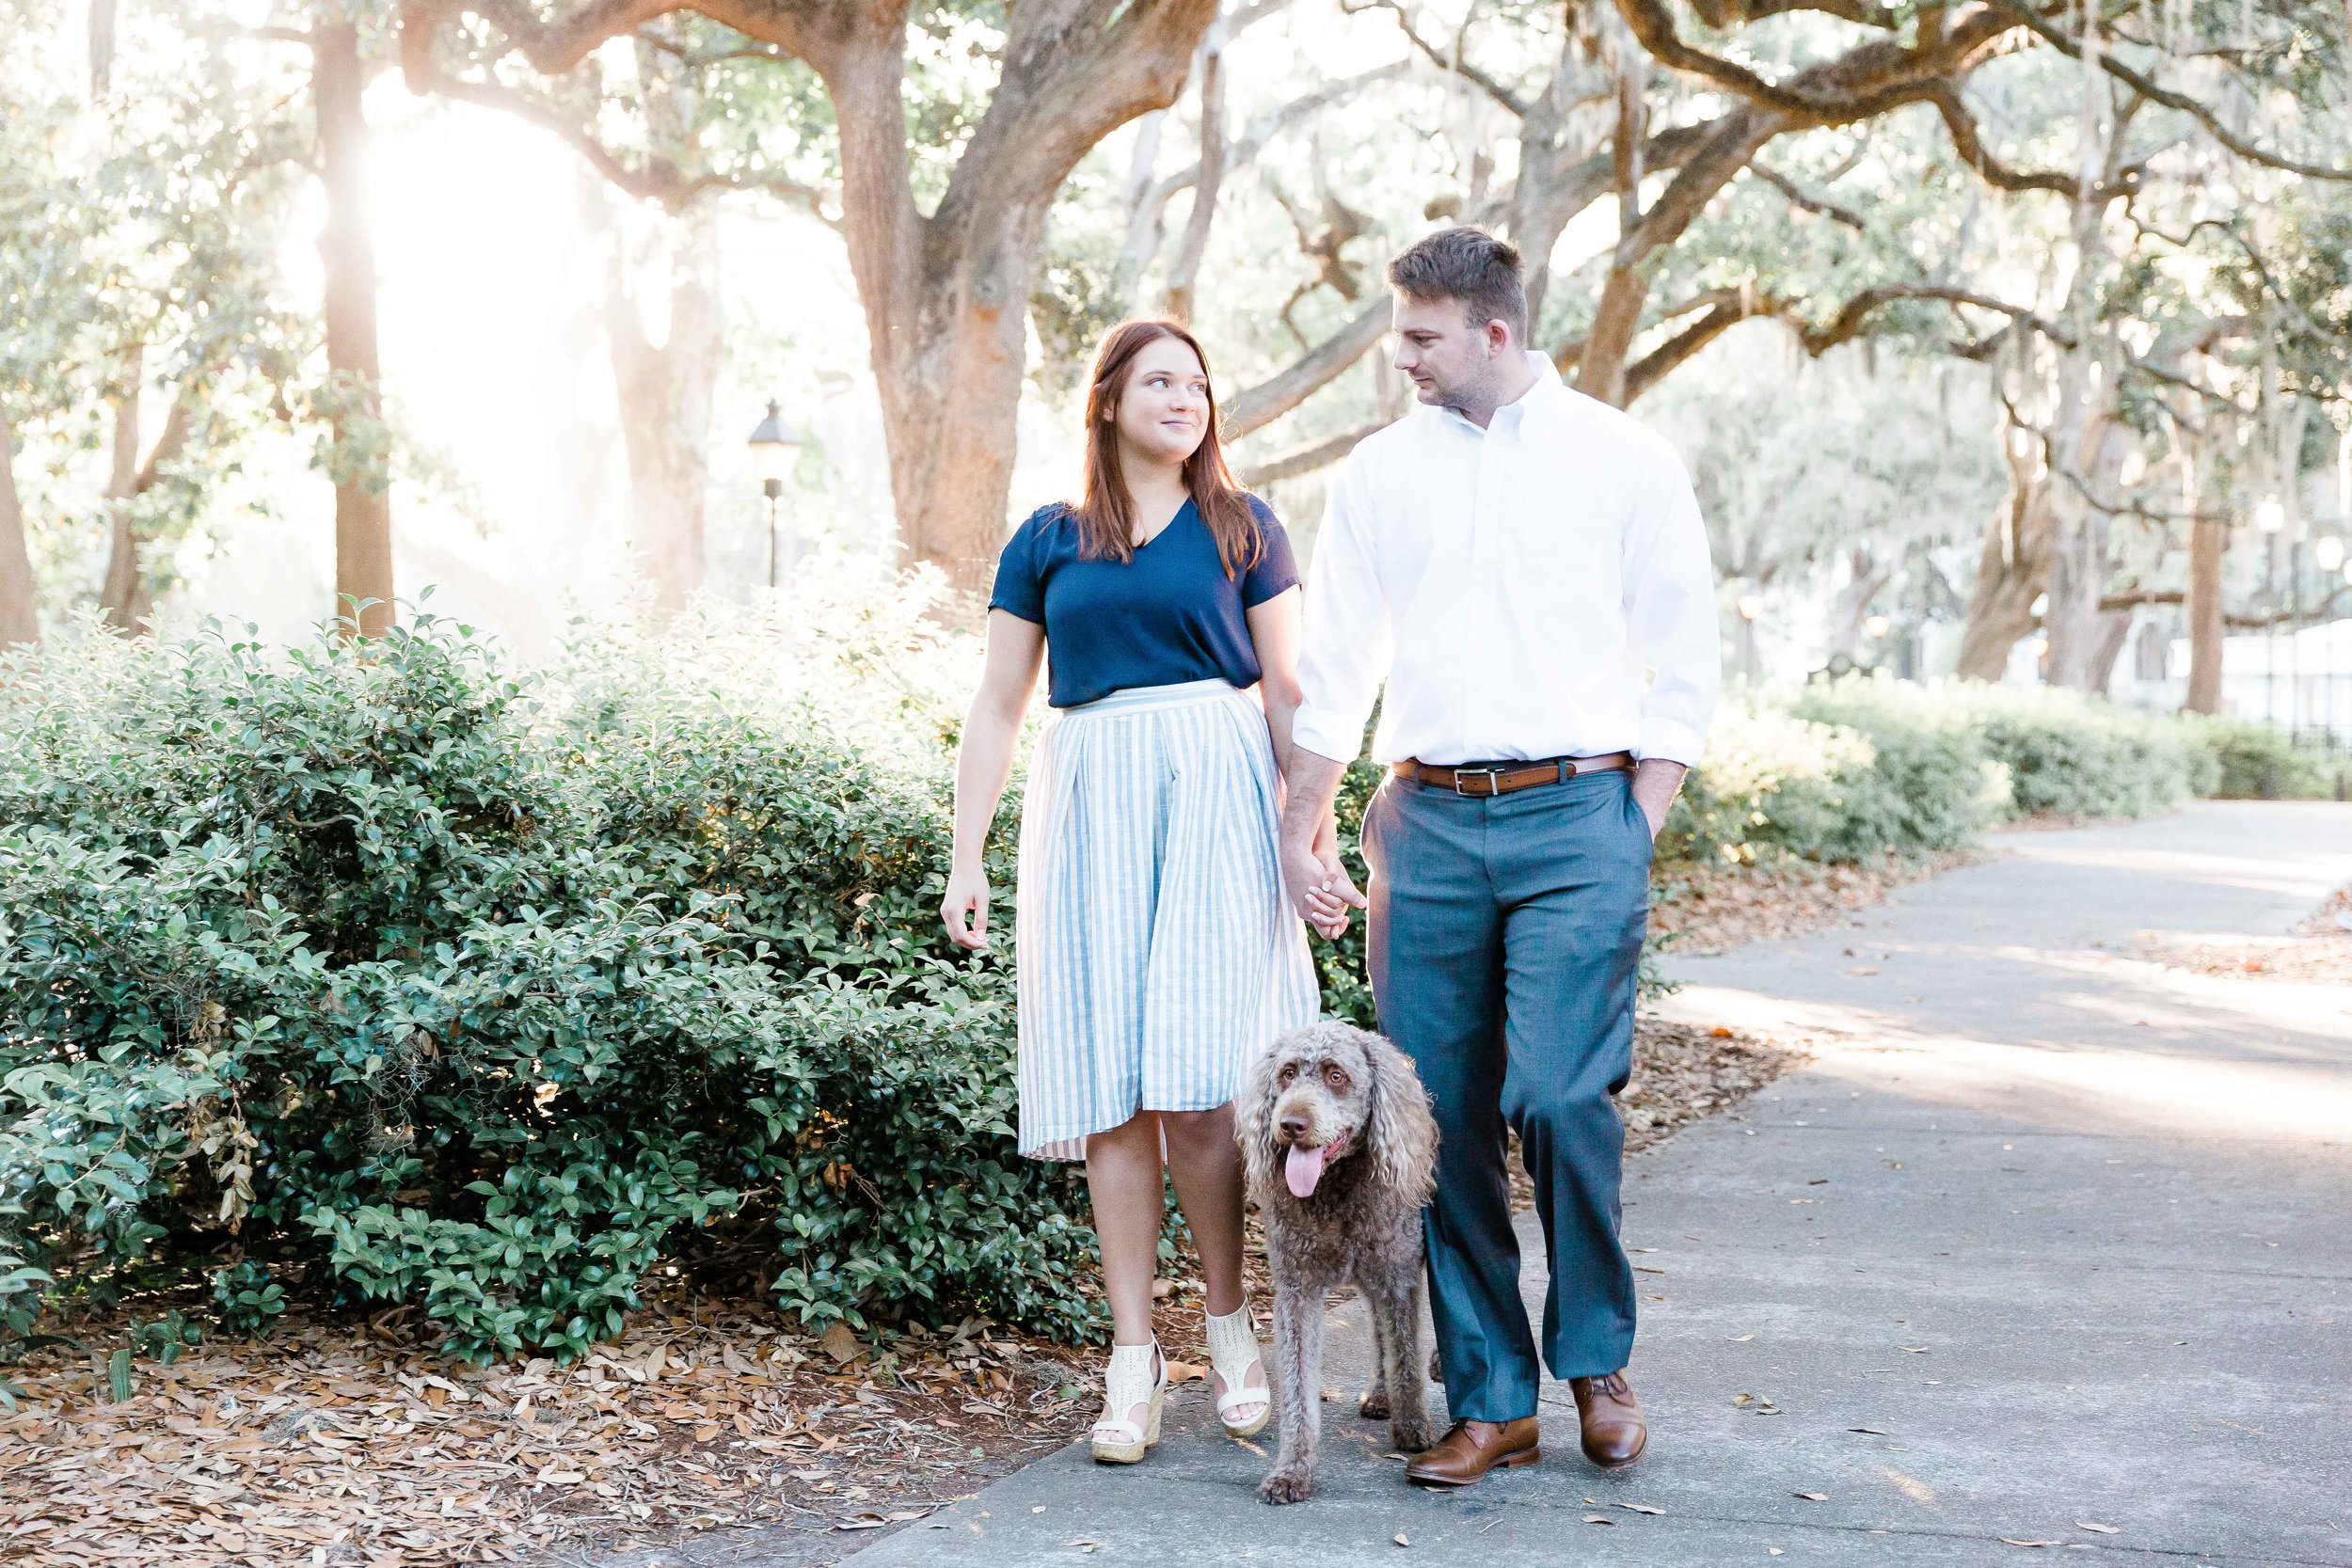 20190519Georgia-Savannah-Kristen & Zach-Forsyth Park-Lafayette Square05.jpg